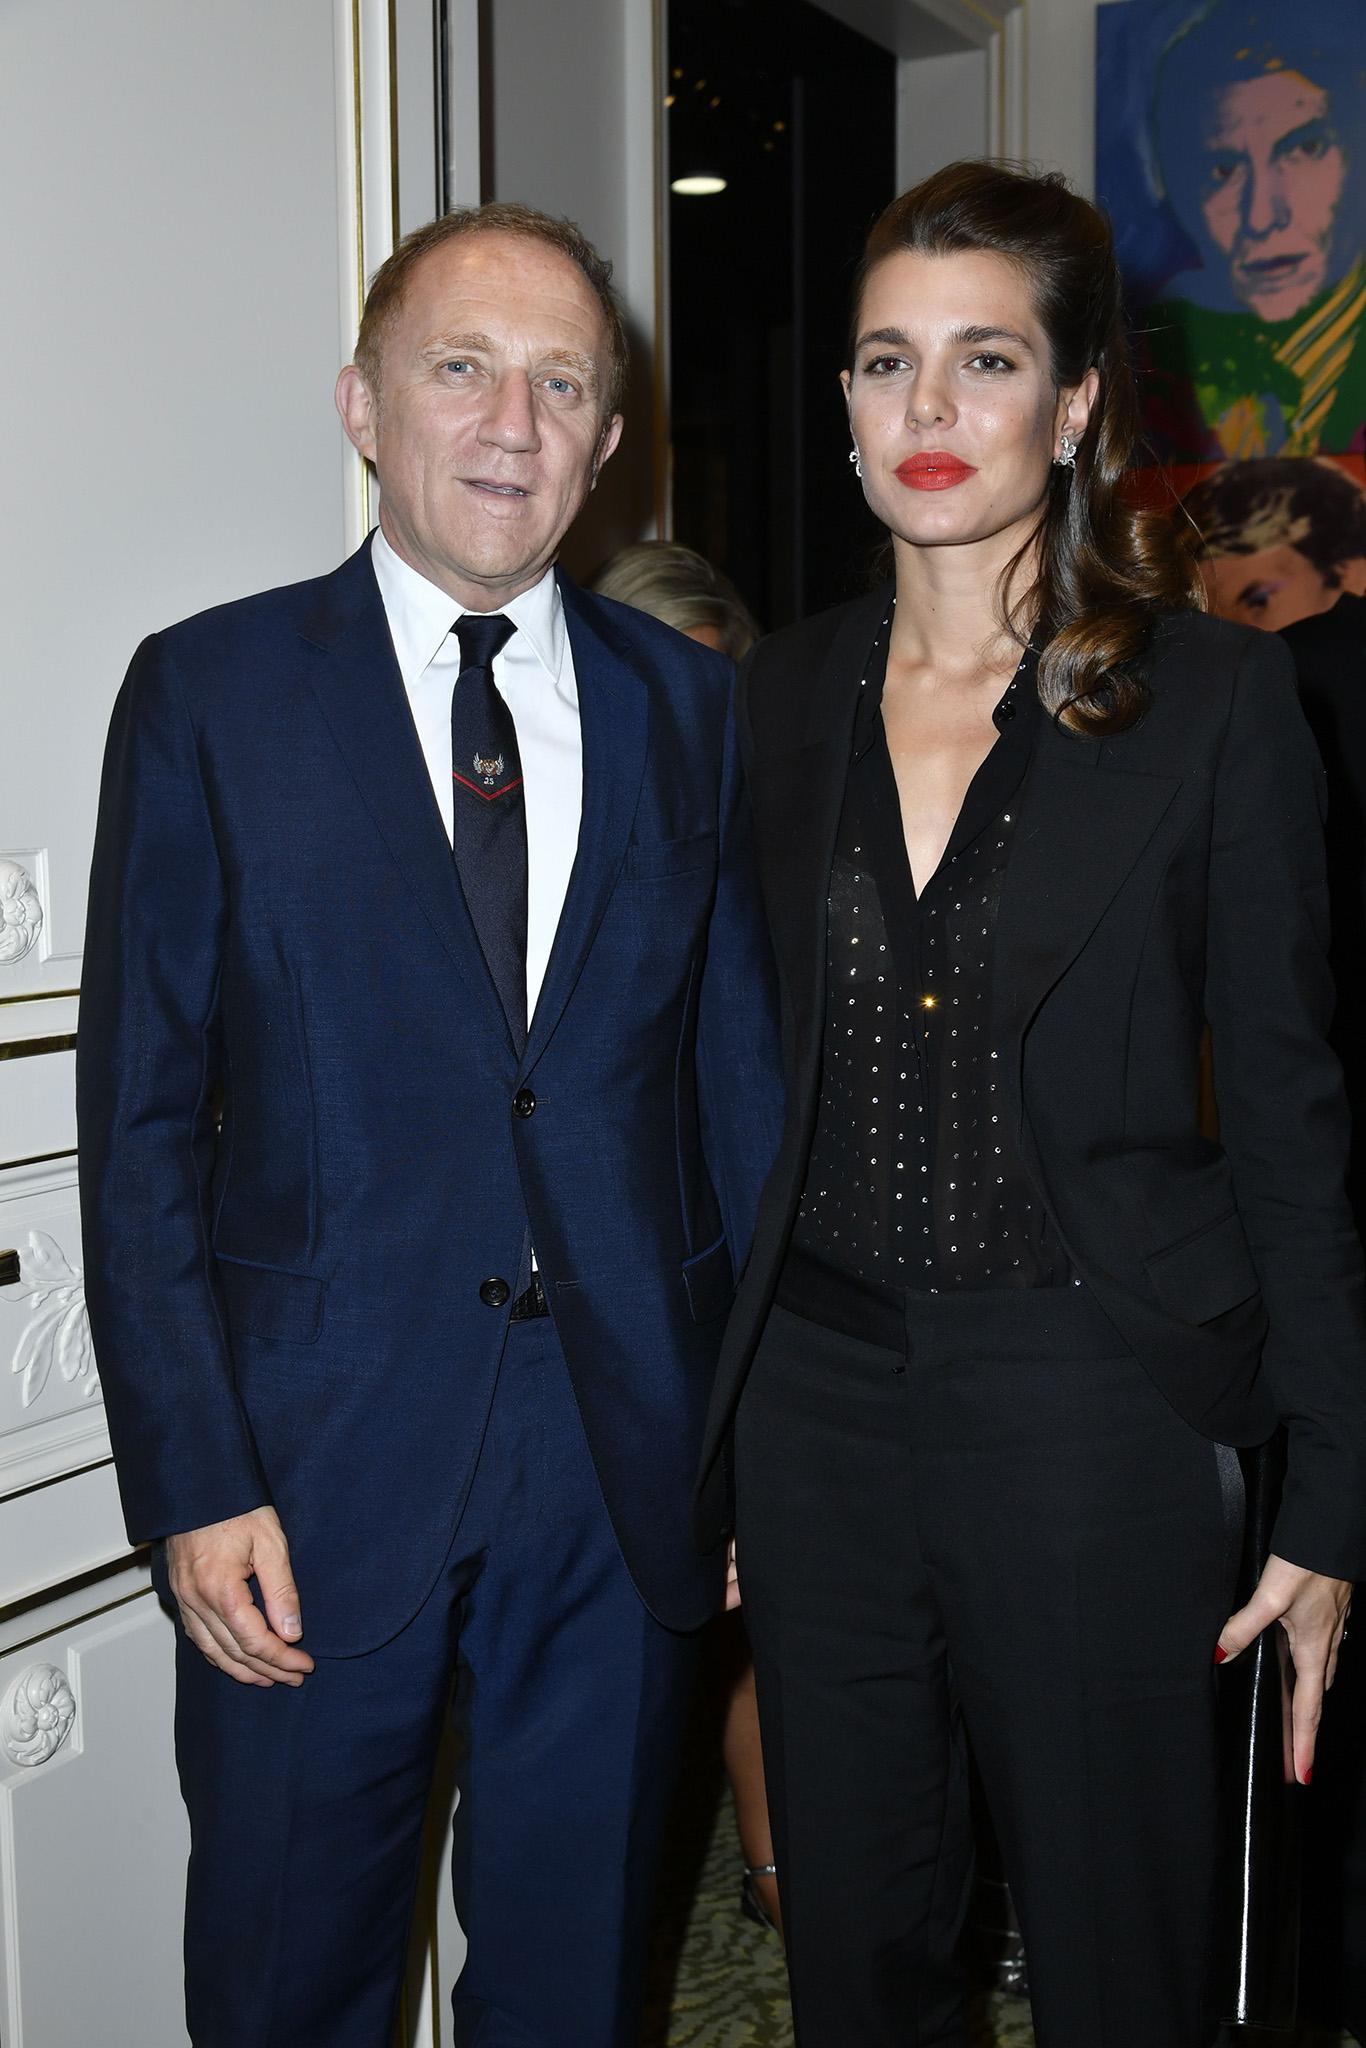 François-Henri Pinault and Charlotte Casiraghi